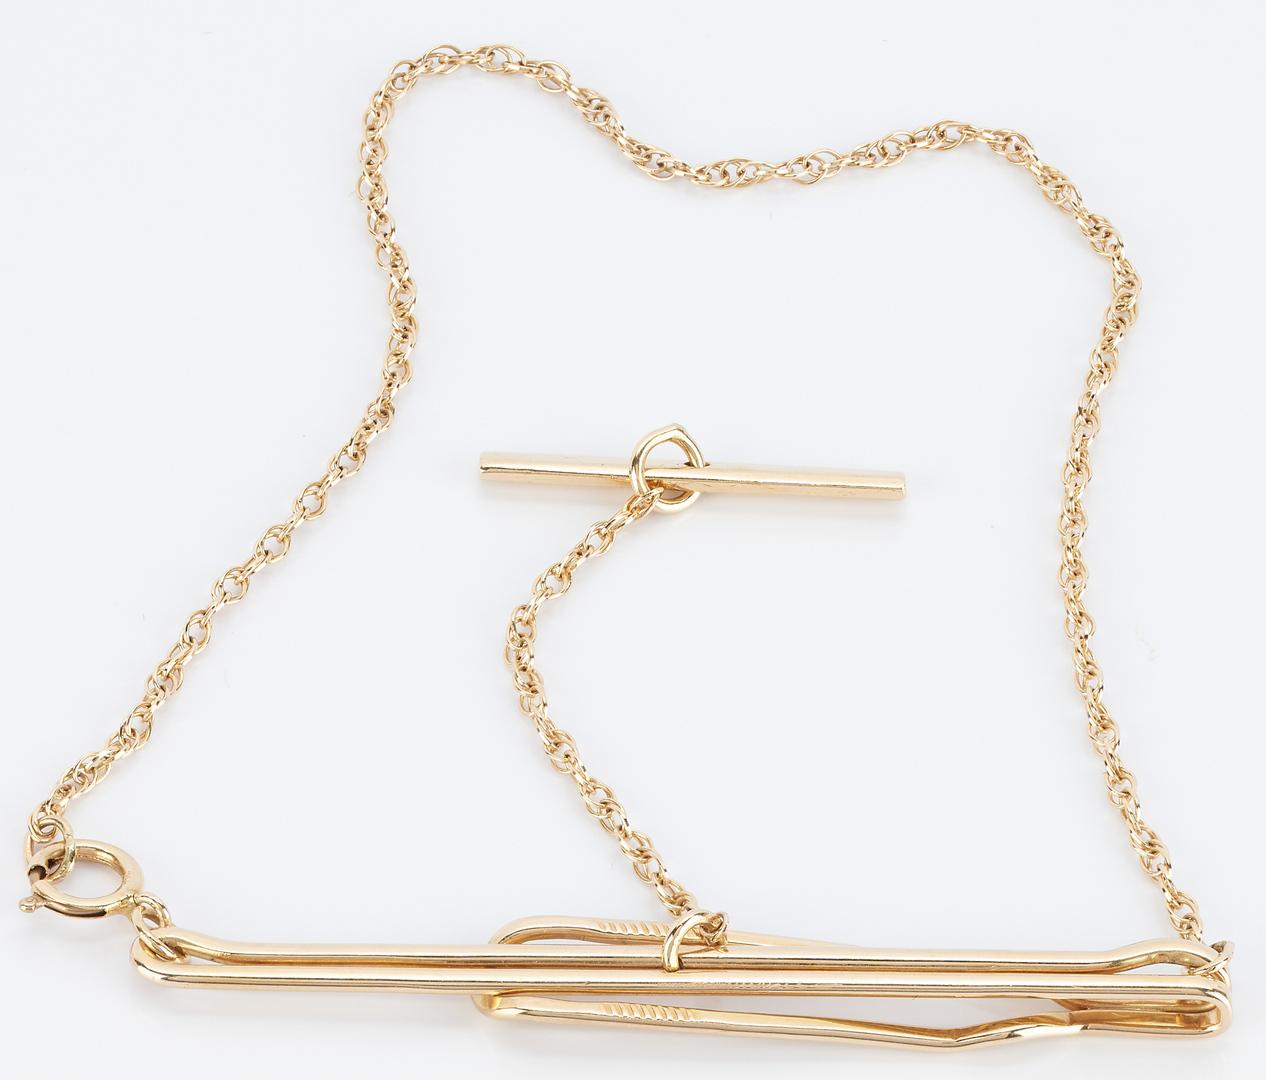 Lot 942: Men's 14K Tie Bar Clip w/ Swag Chain